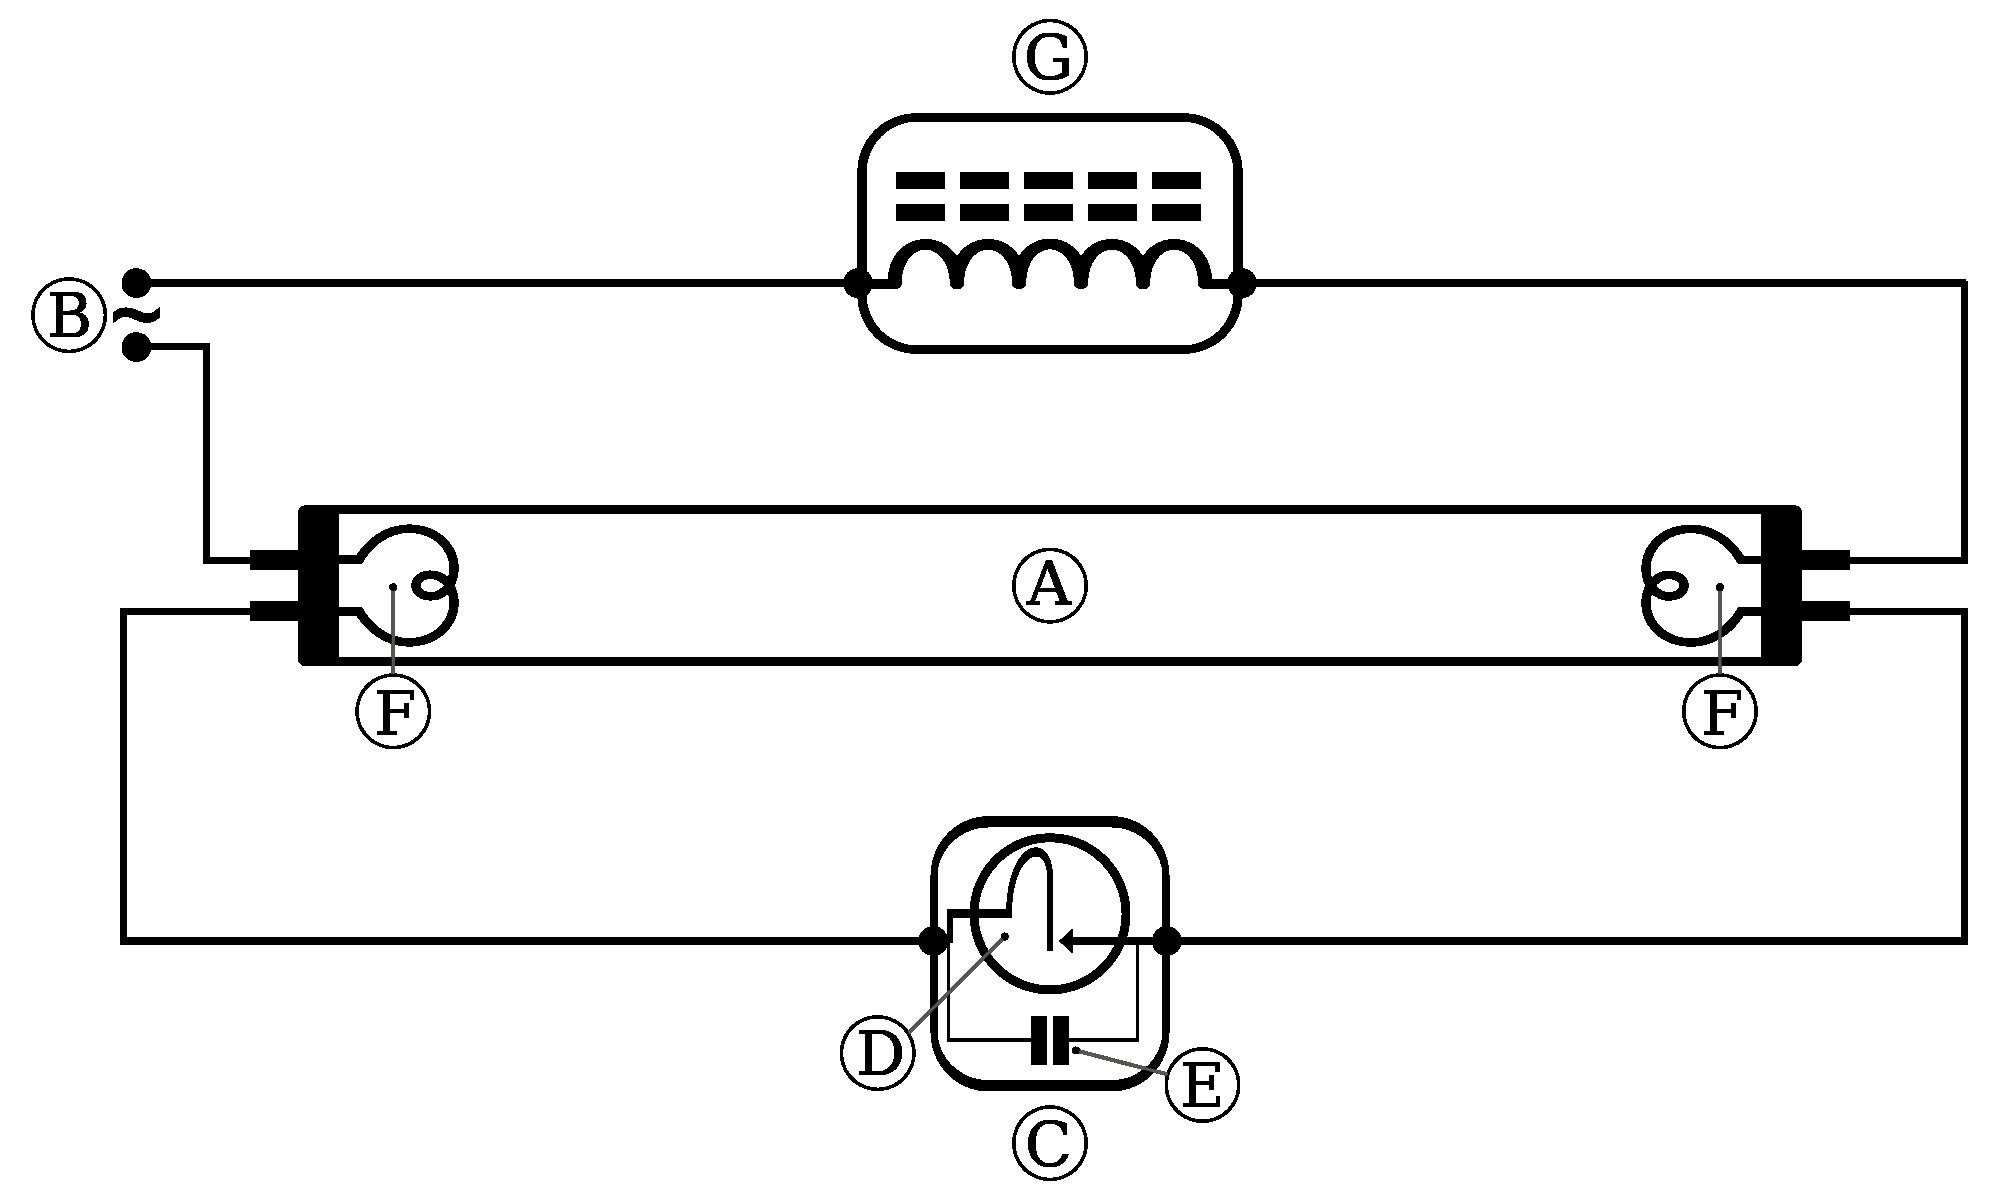 Led Tube Light Wiring Diagram Fluorescent Lamp Wiring Diagram Bright Bulb Afif Of Led Tube Light Wiring Diagram